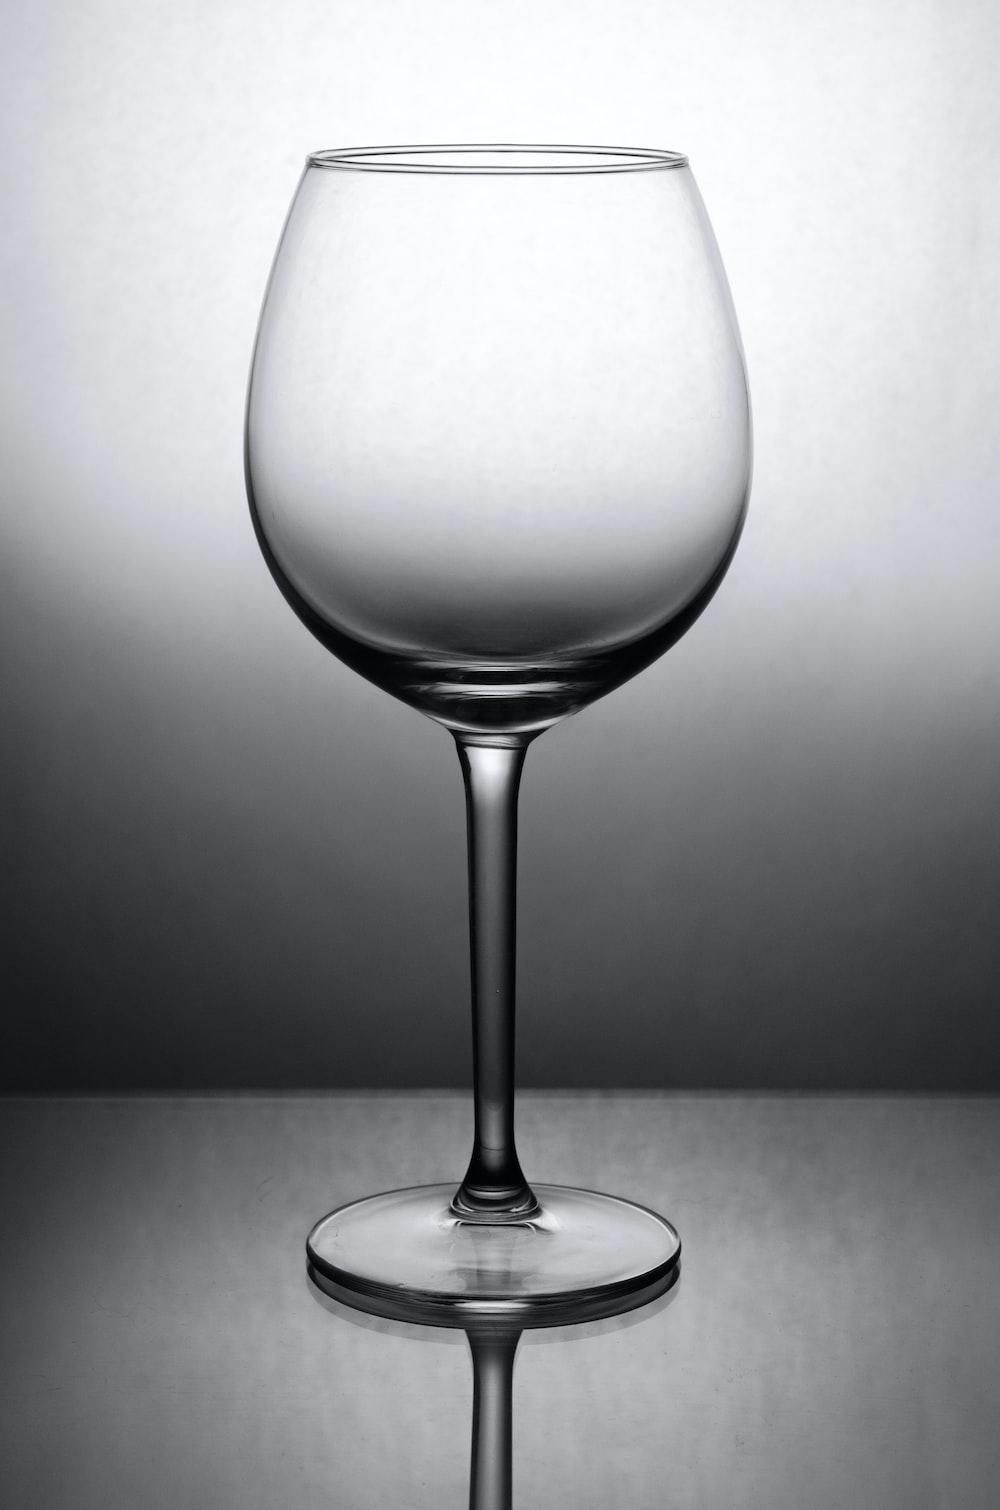 grayscale photo of wine glass